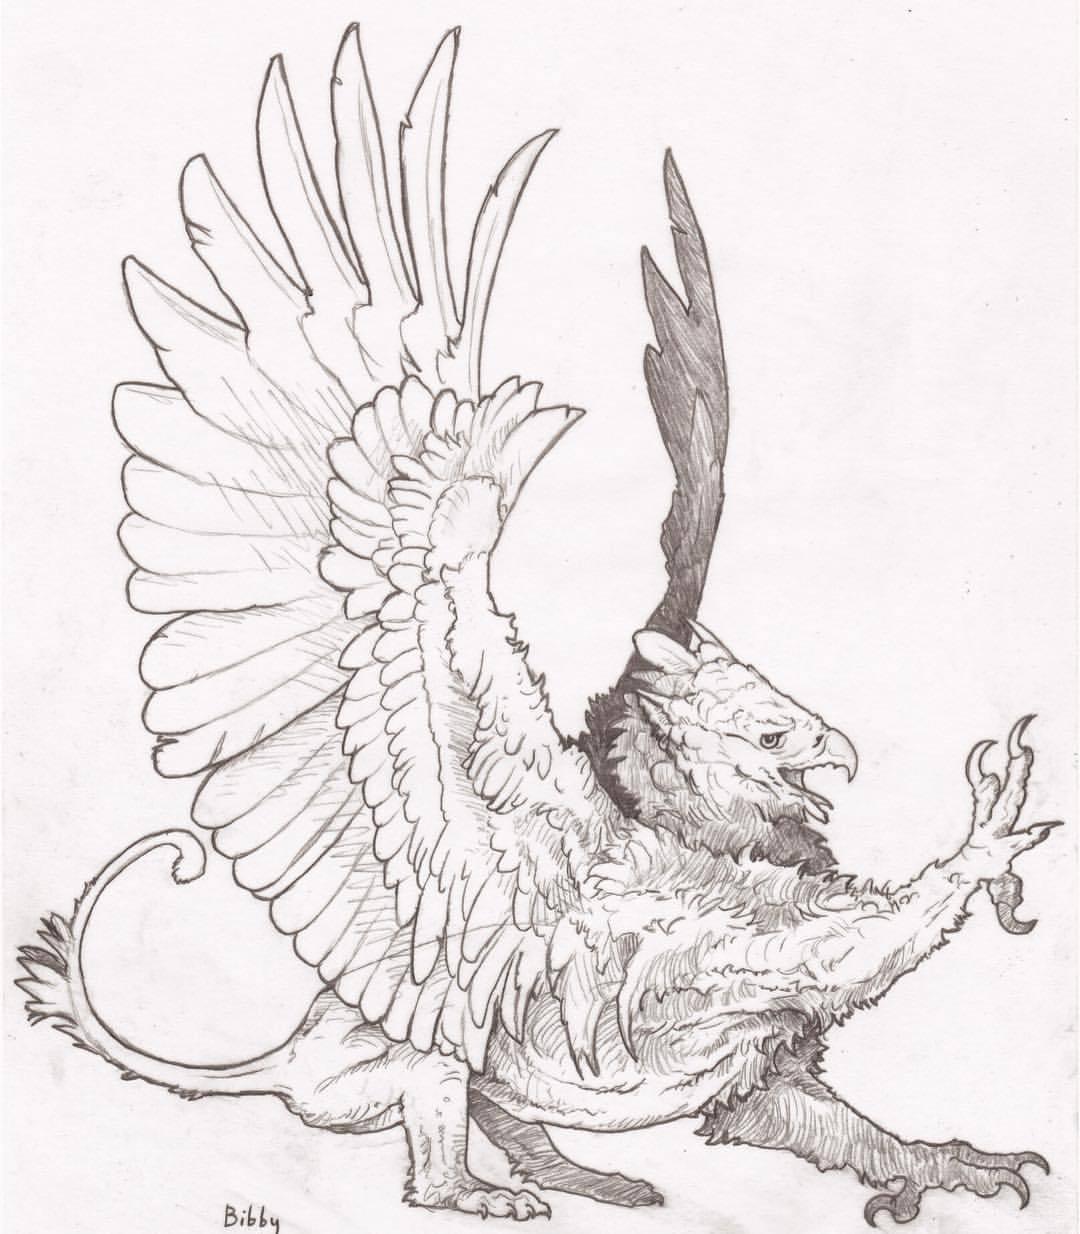 1080x1234 Nick Bibby Sculpture Thumbnail Concept Sketch For My Next Bronze